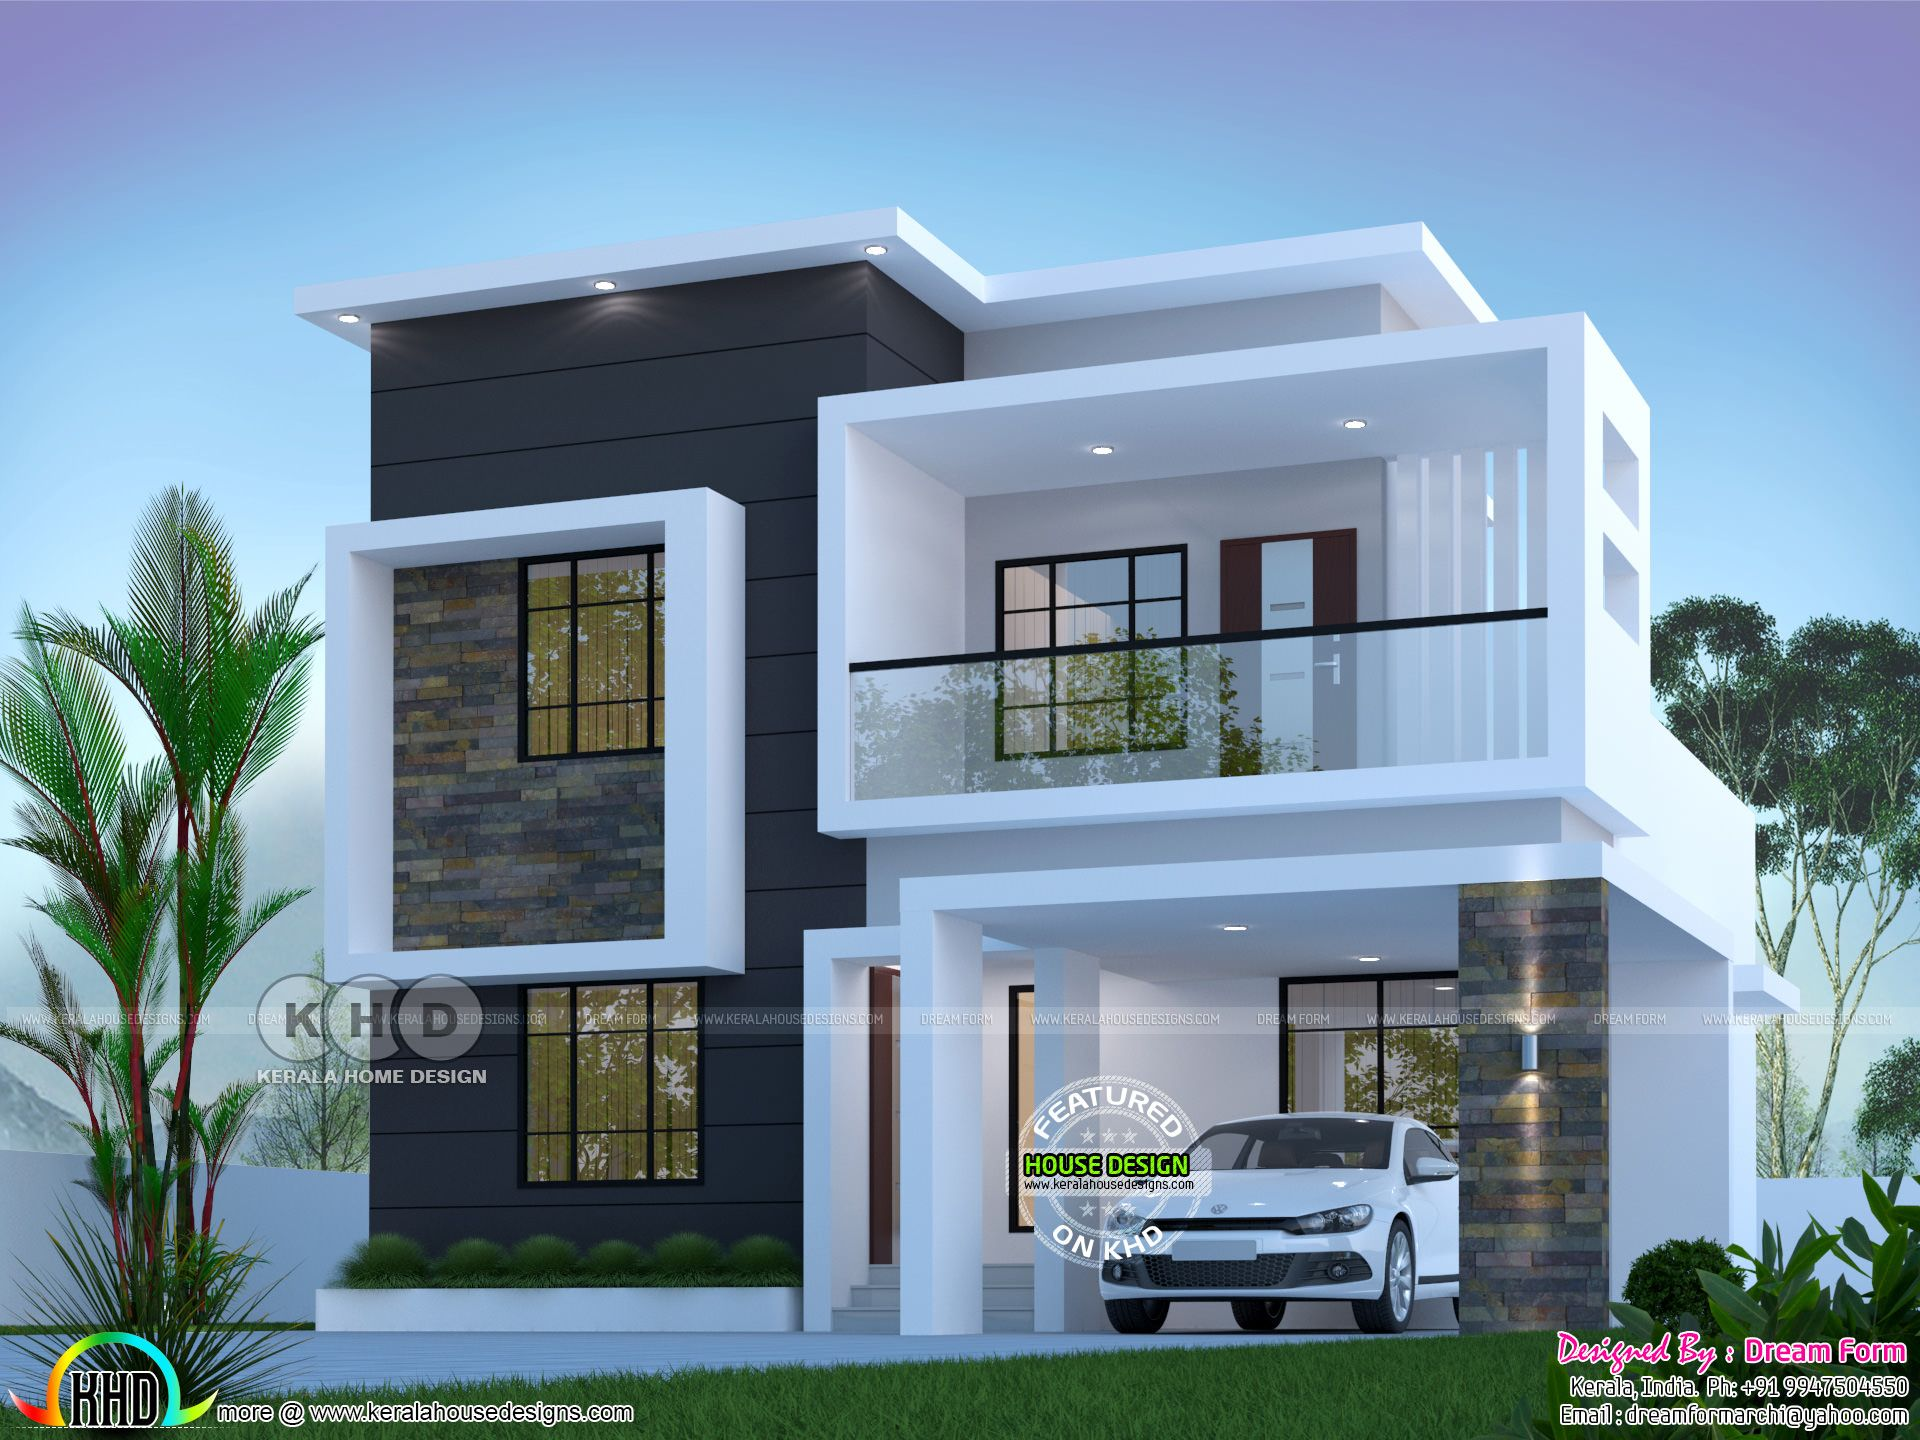 House Plans 1800 Sq Ft Modern In 2020 Architect Design House Kerala House Design Modern Contemporary House Plans